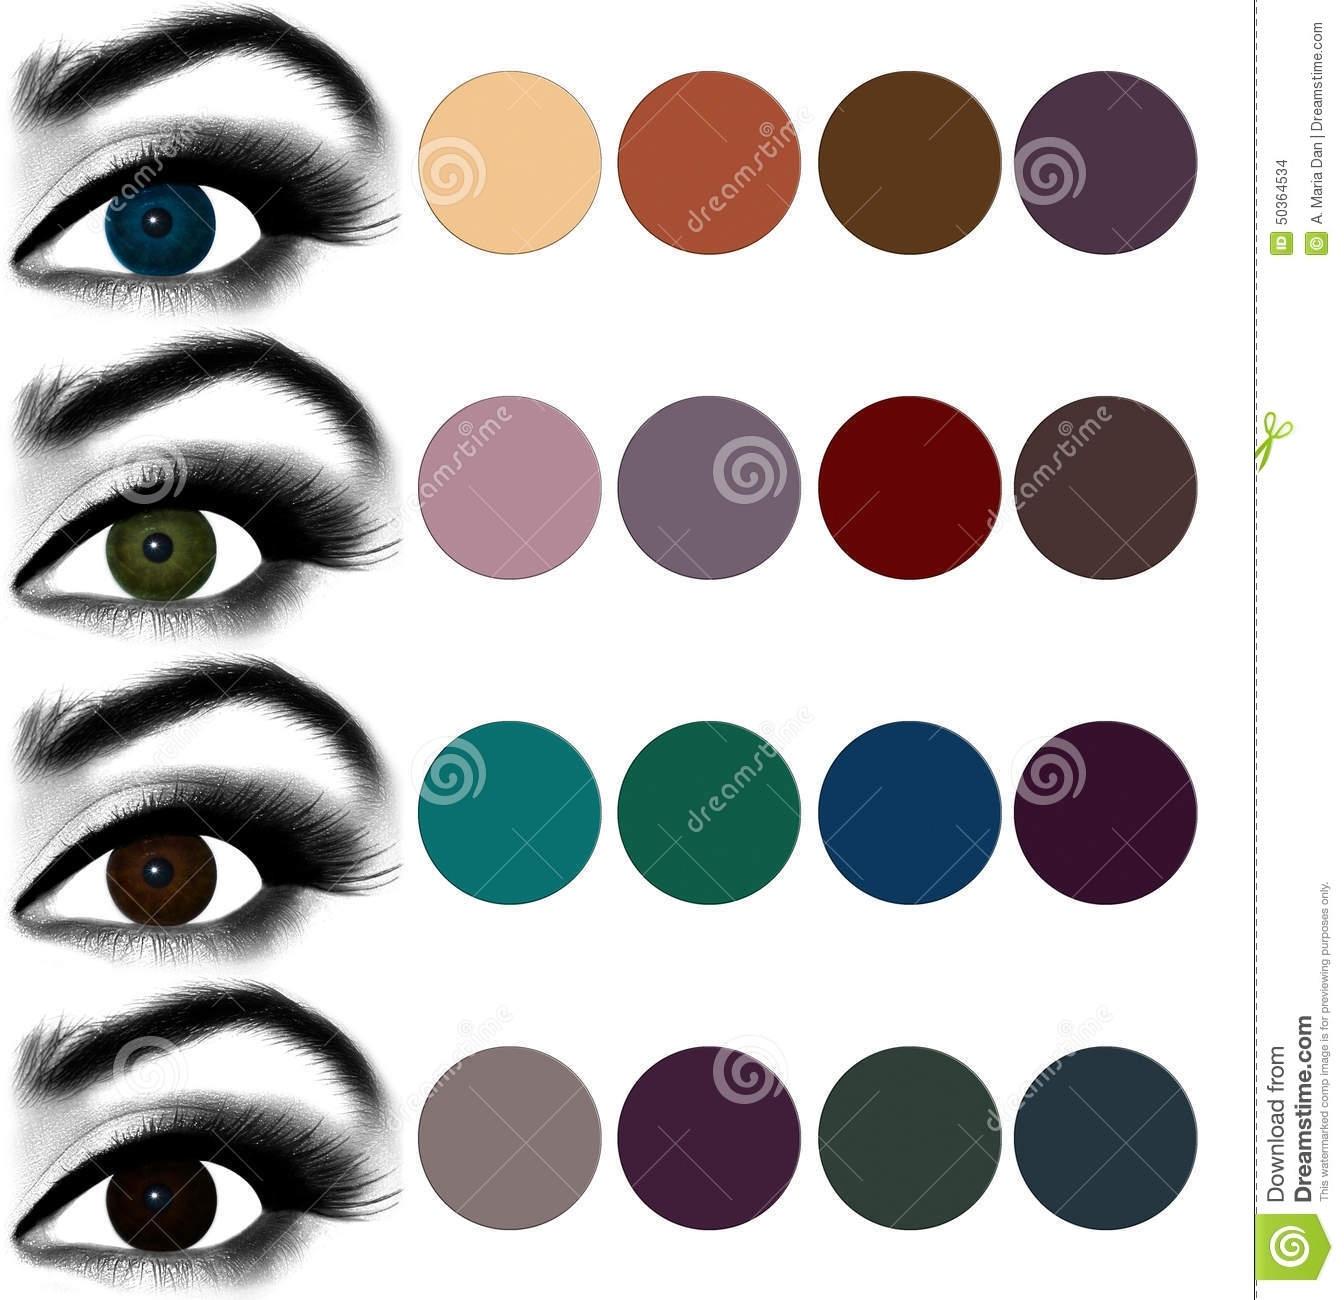 best eyeshadow colors for green eyes - wavy haircut